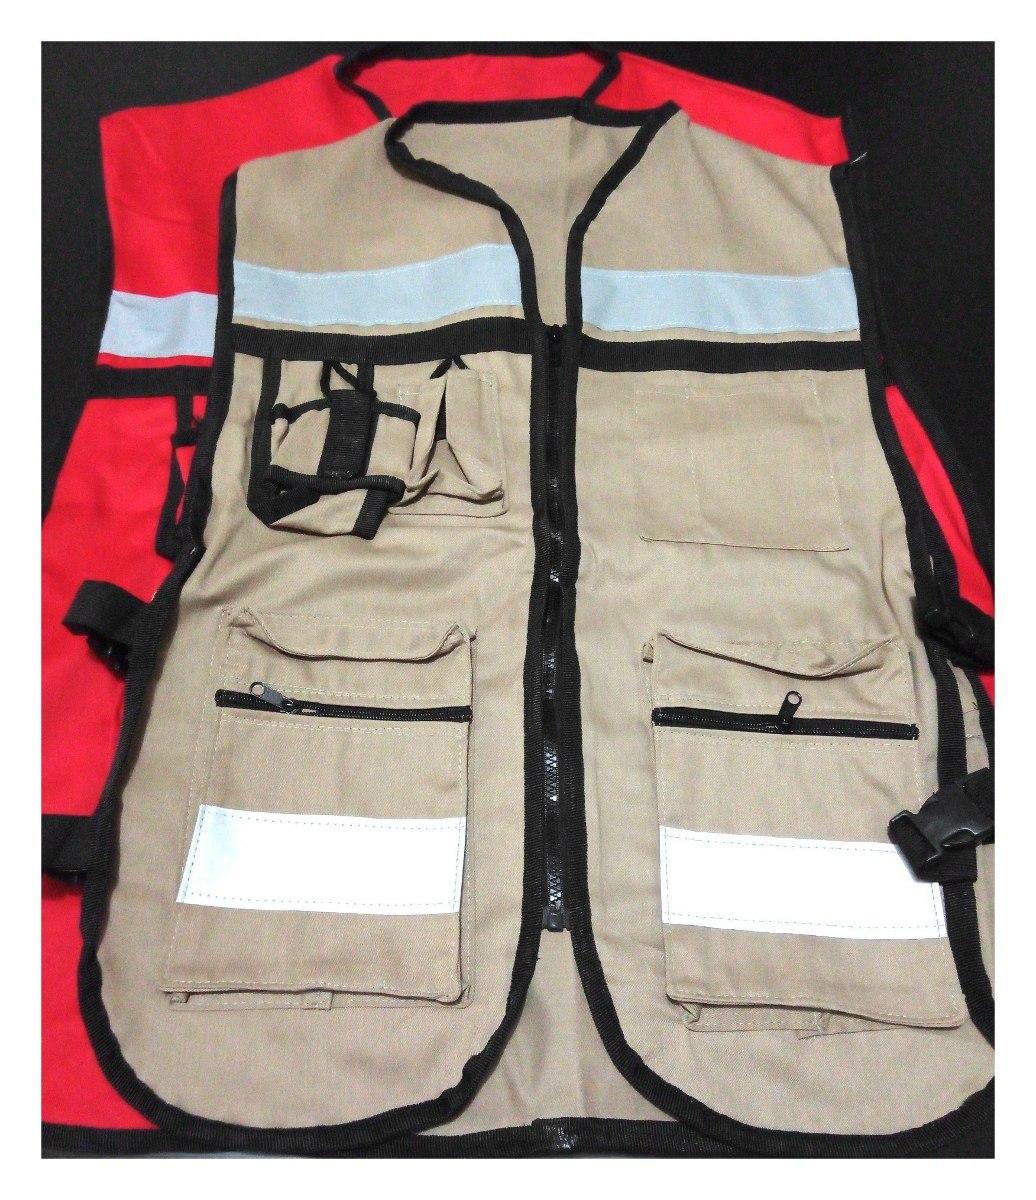 Chaleco Seguridad Industrial, Brigadista,pack 4pzas Jumbo - $ 800.00 ...